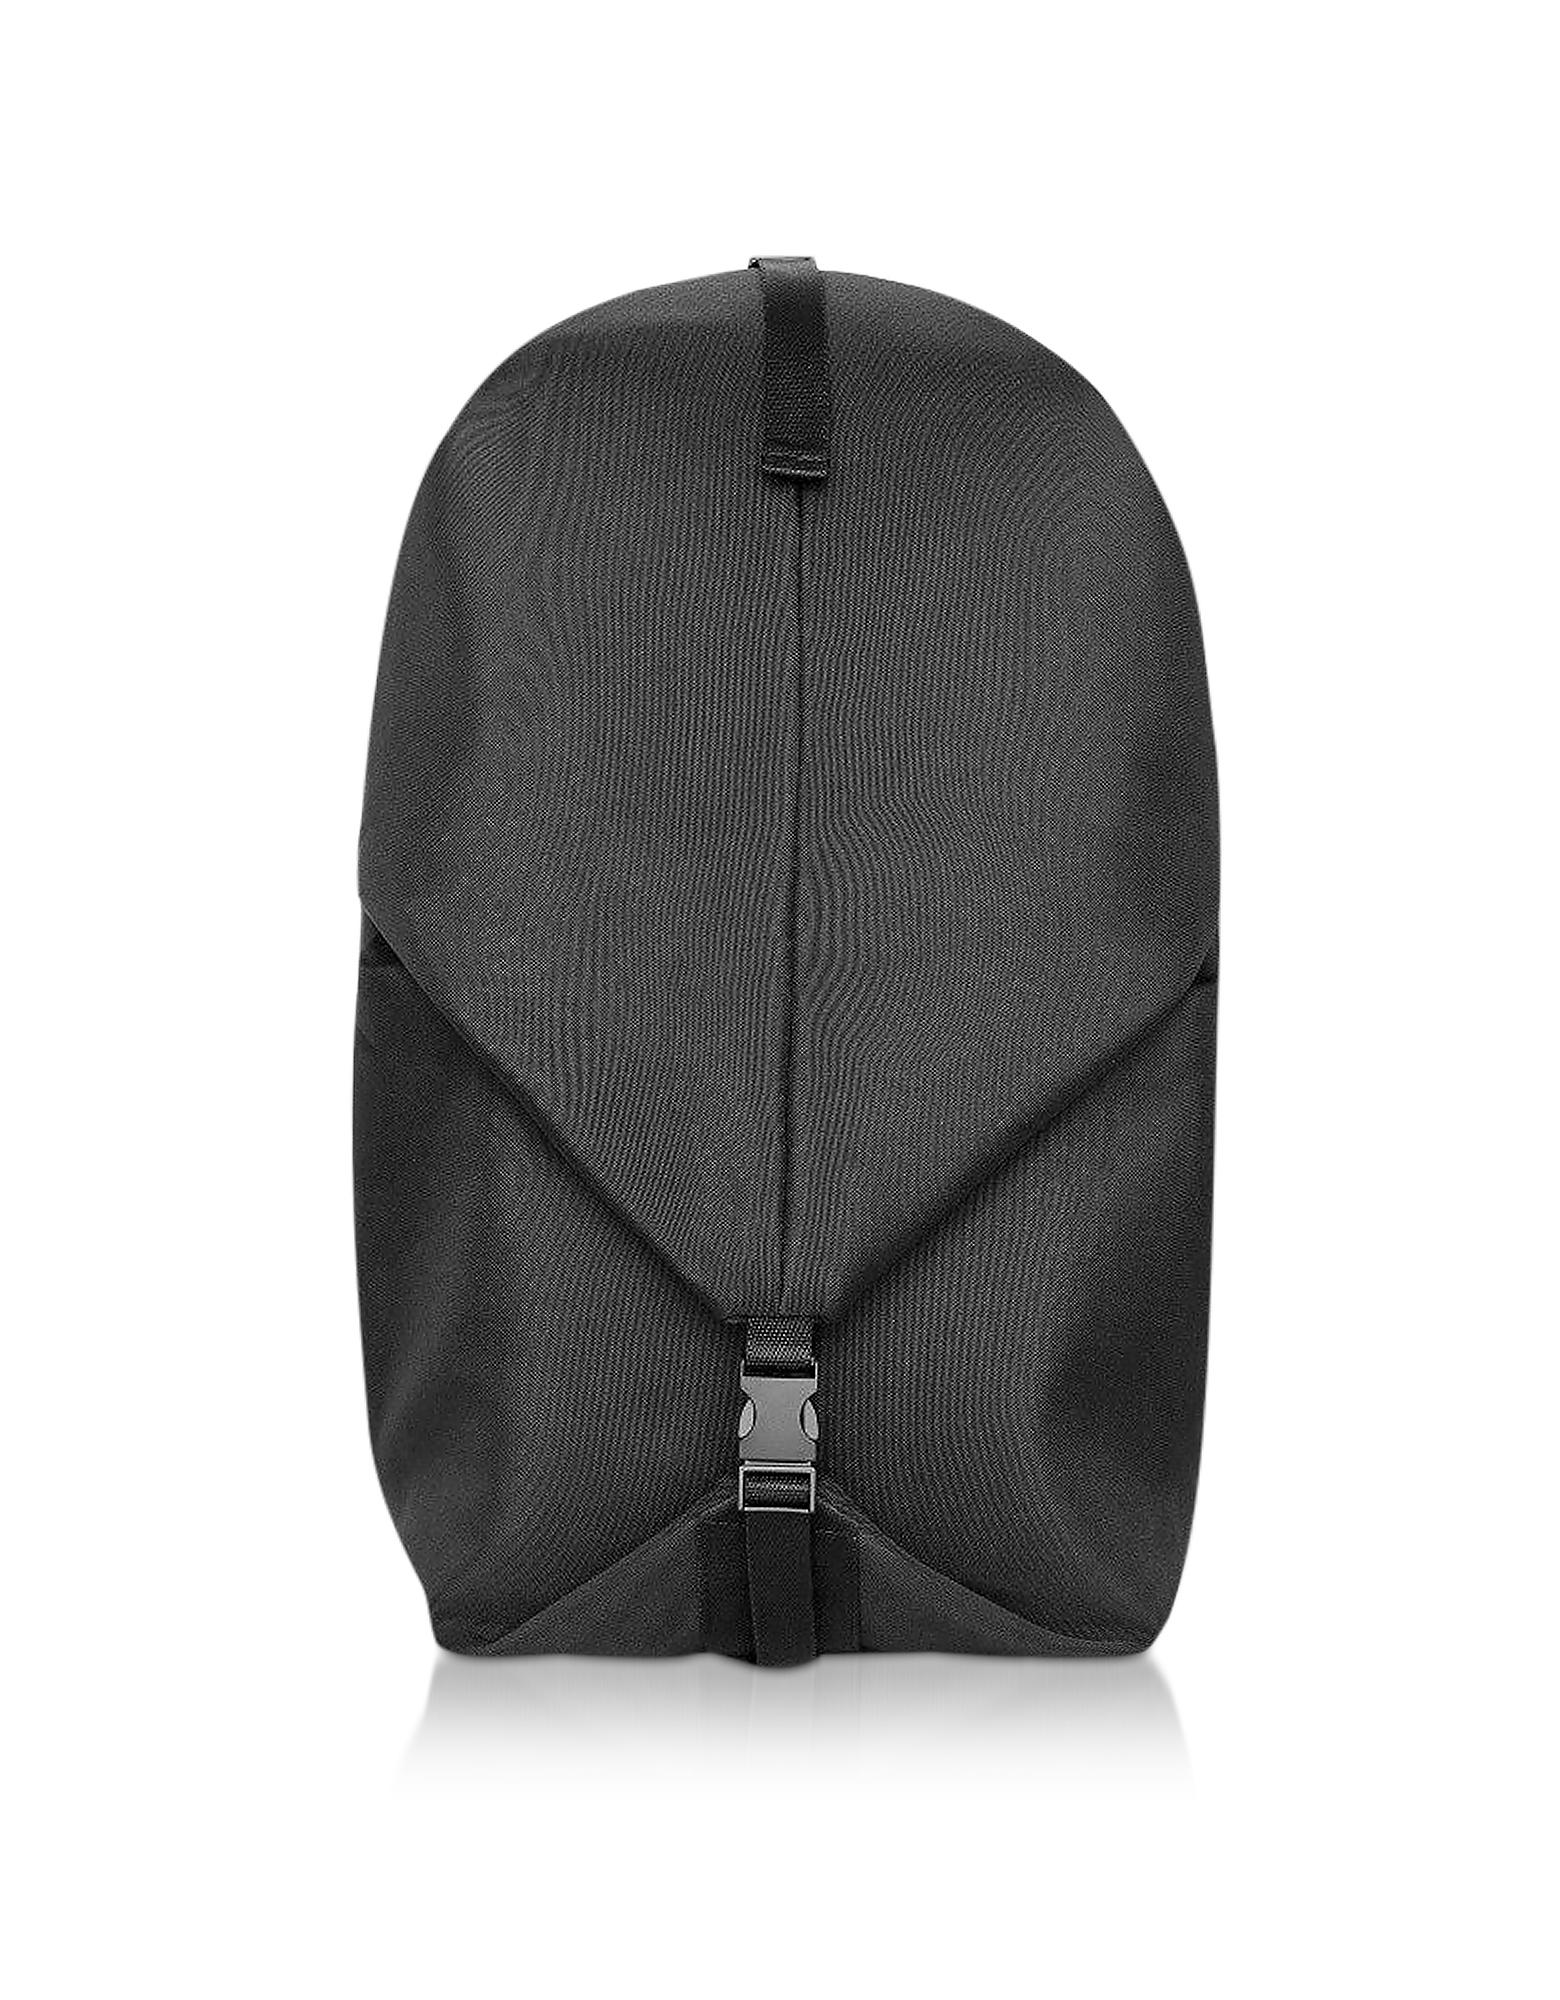 Black EcoYarn Oril S Backpack